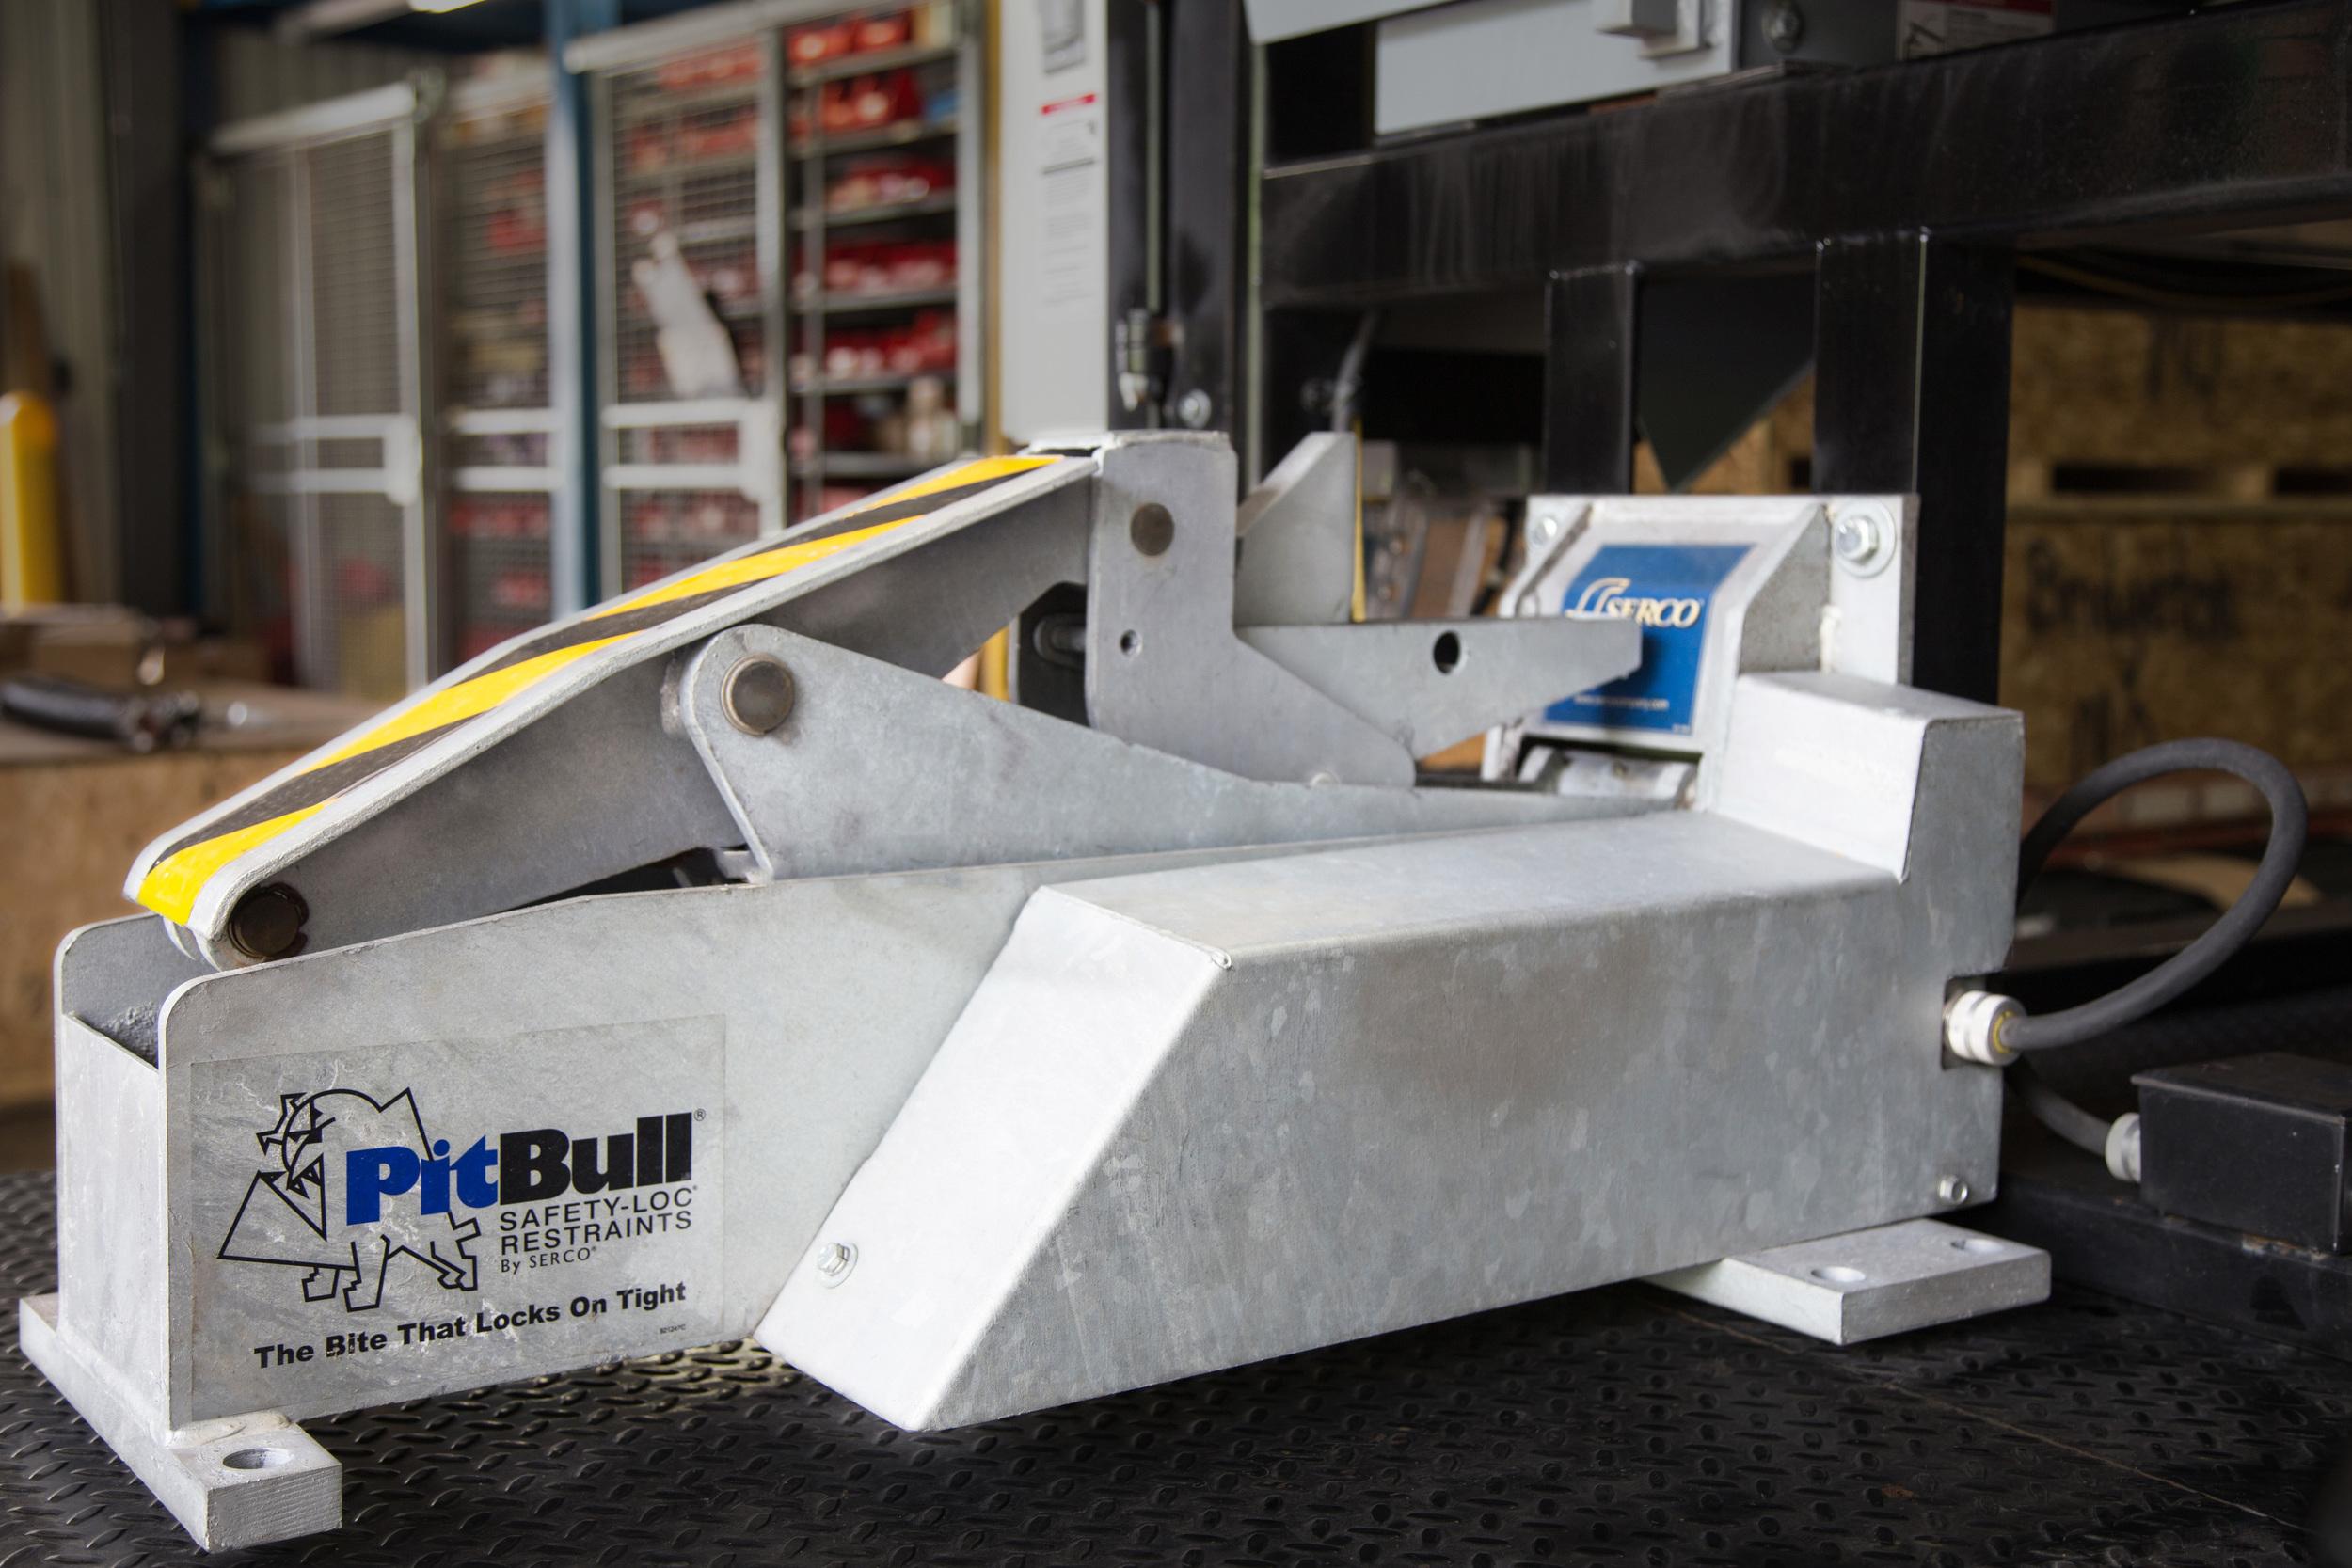 serco pitbull trailer restraint with optional ground mount [ 2500 x 1667 Pixel ]